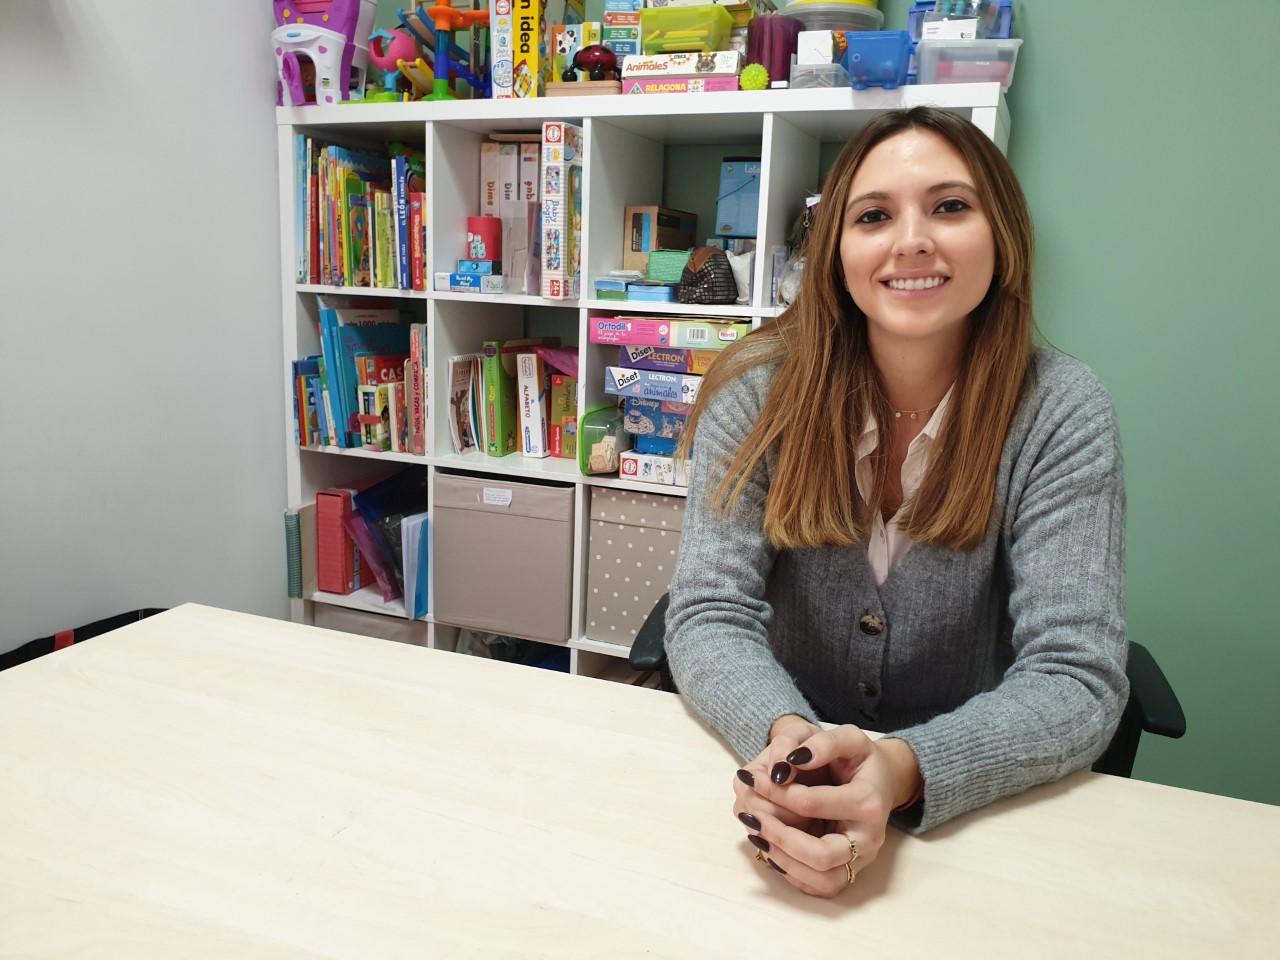 Noelia Reig Aguilar